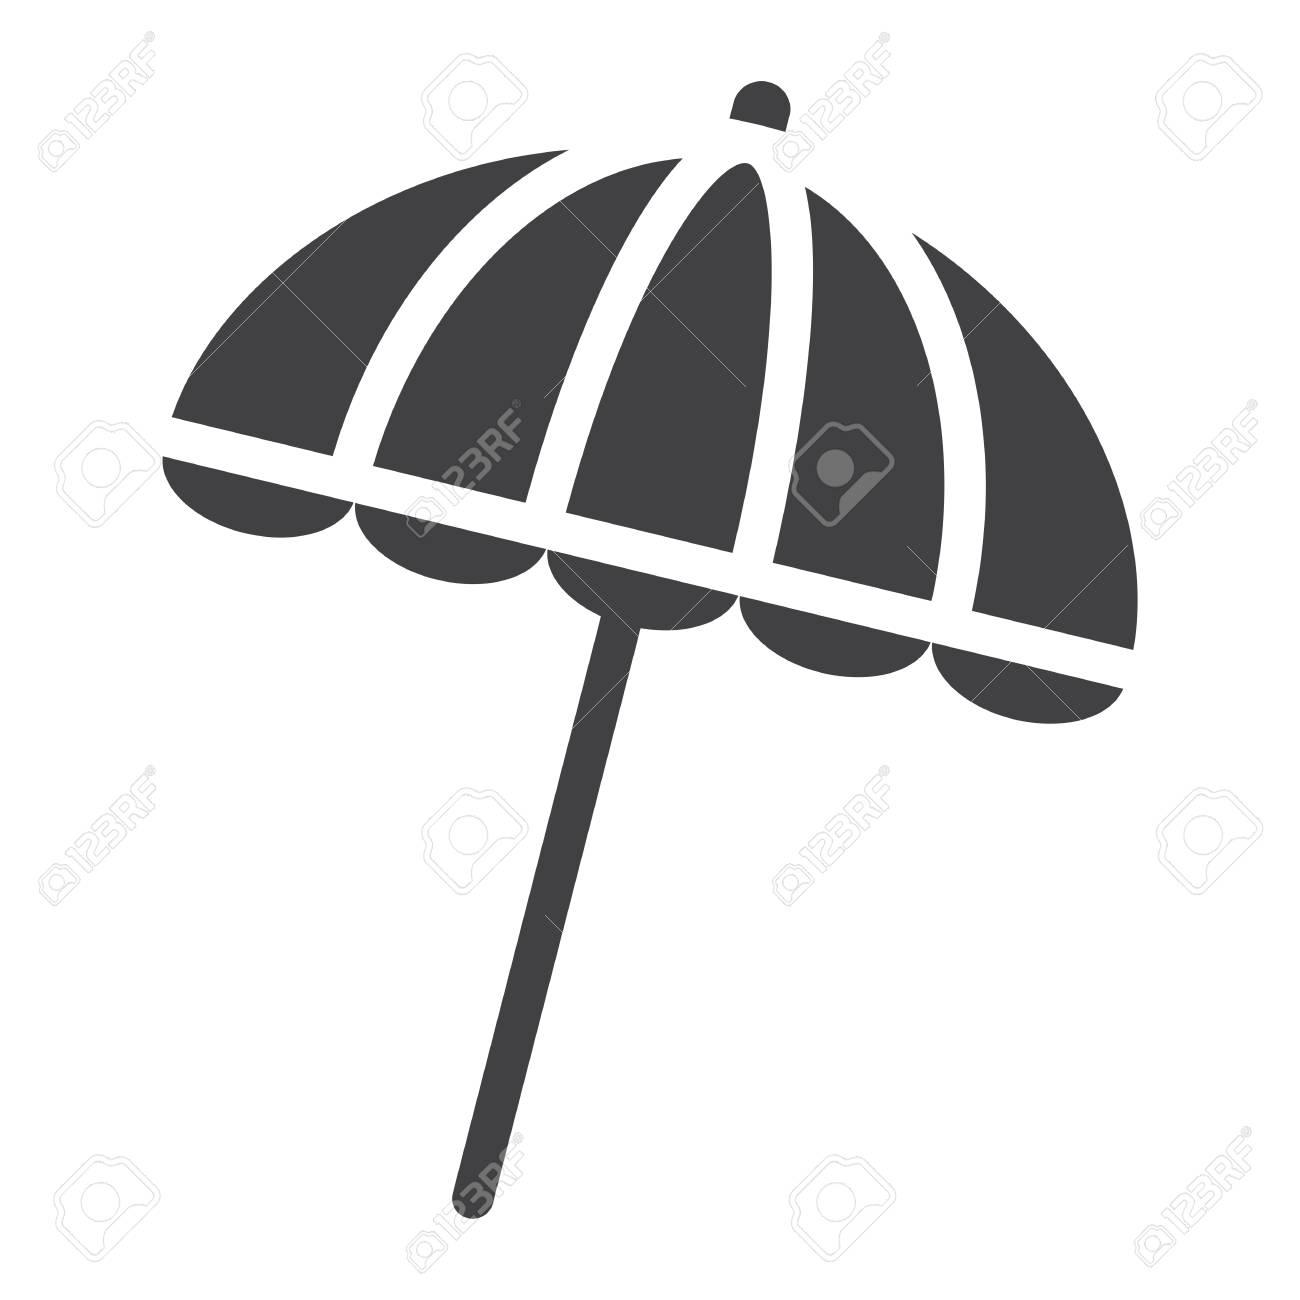 6e0e035a3766 Sun umbrella solid icon, travel and tourism, parasol, a filled..